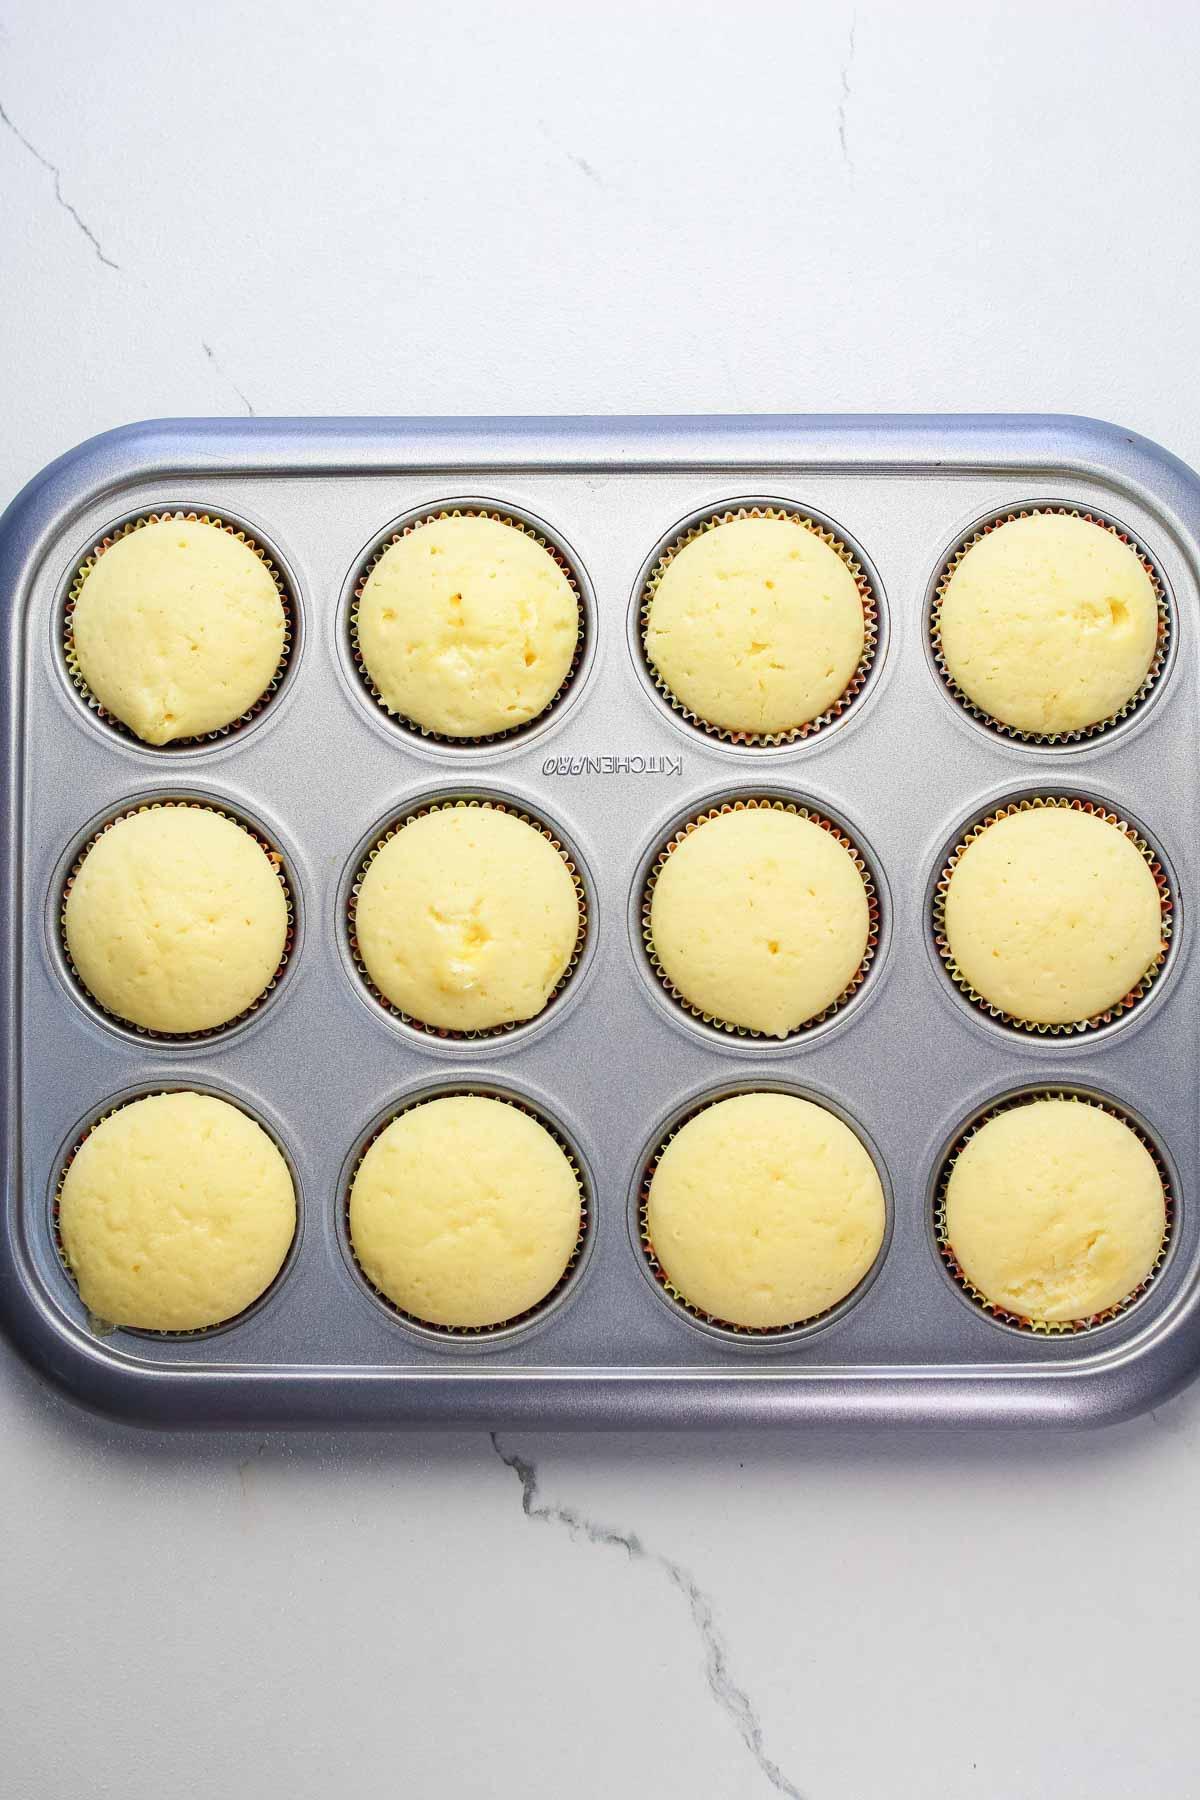 Baked lemon cupcakes still in the cupcake pan